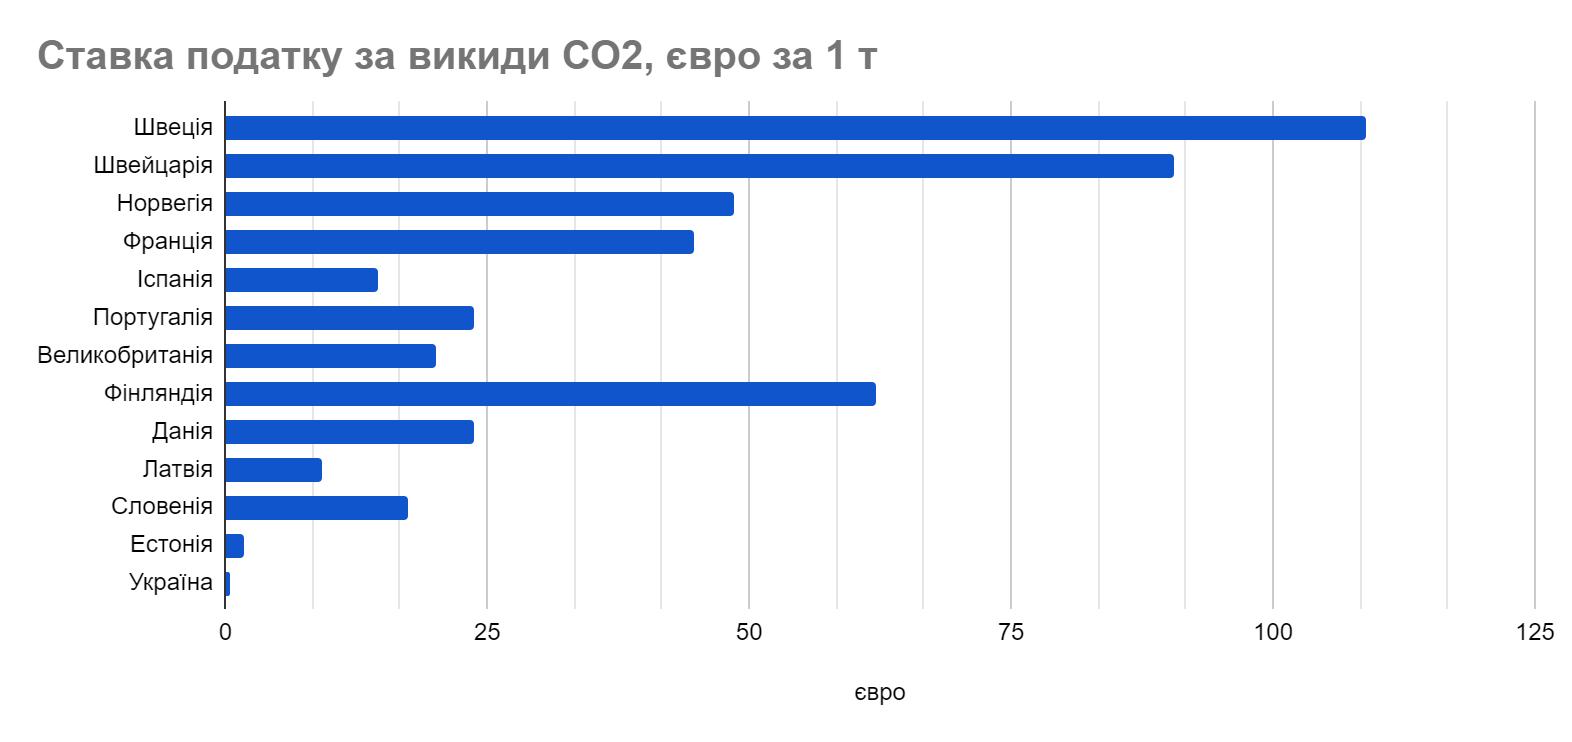 рис. 4 Ставки податків за викиди СО2, джерело Tax Foundation